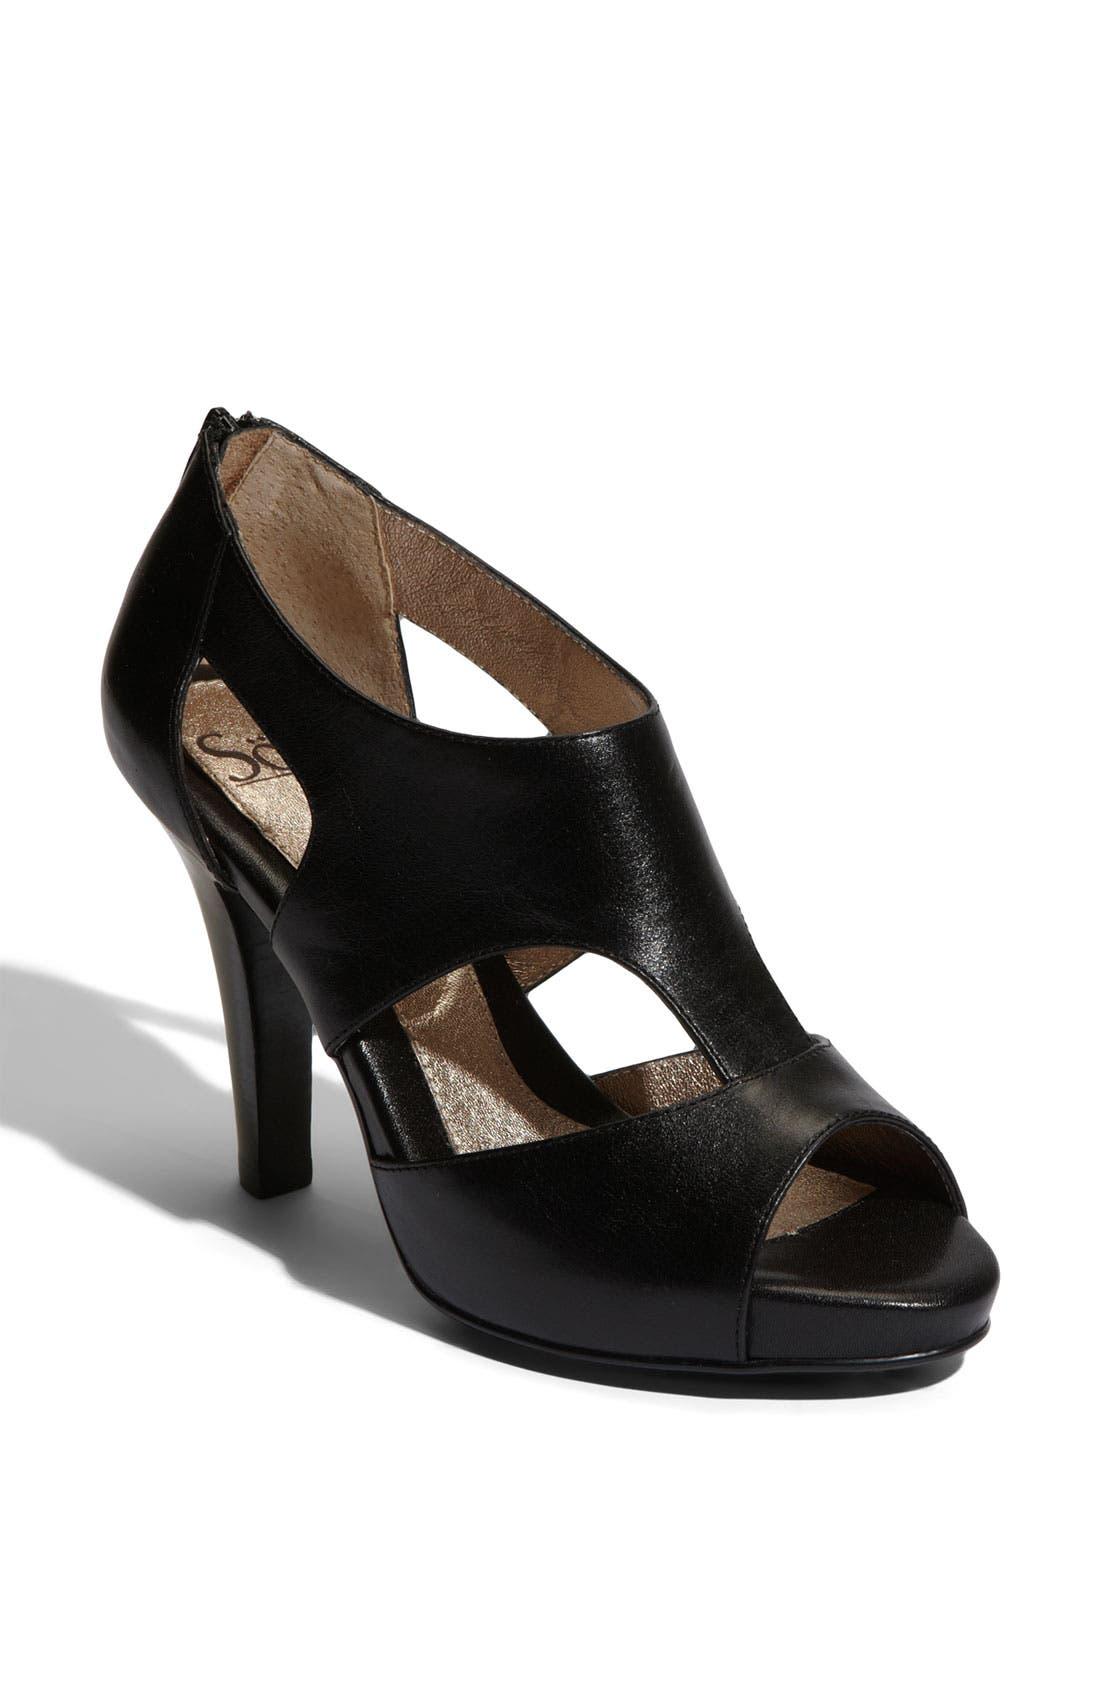 SÖFFT, 'Pavia' Sandal, Main thumbnail 1, color, 001